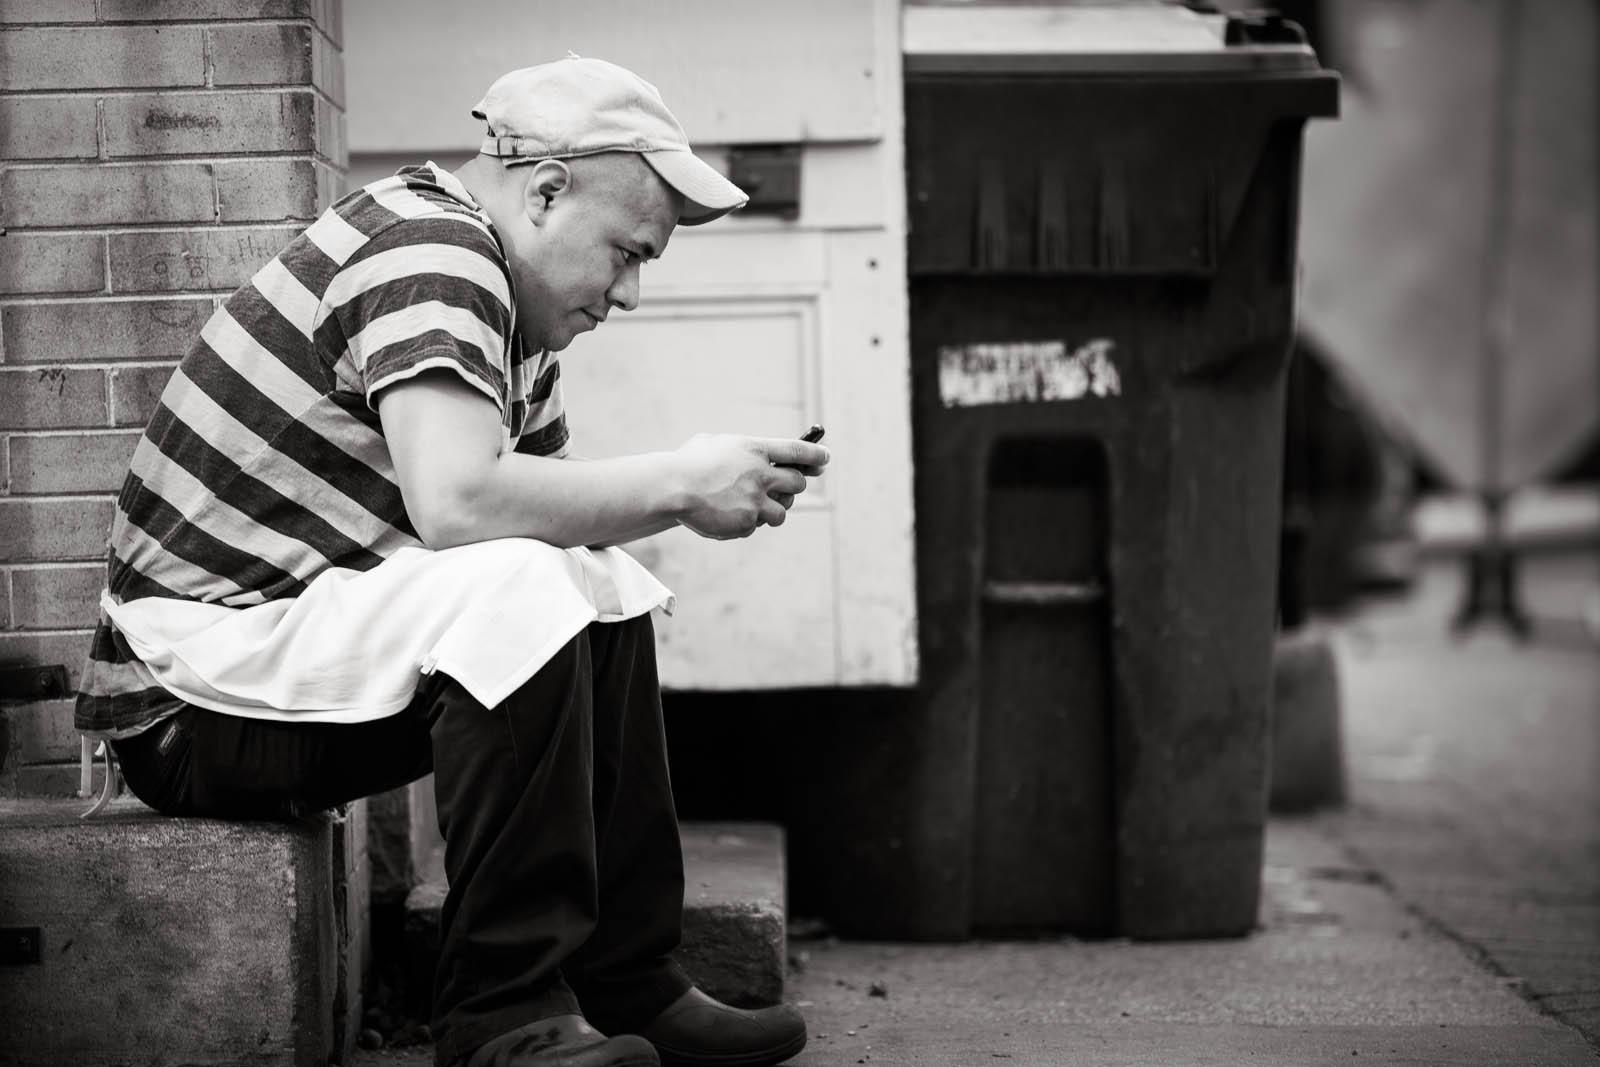 StreetPhotography_DownTownRaleighNC_ErnestoSue-2373.jpg